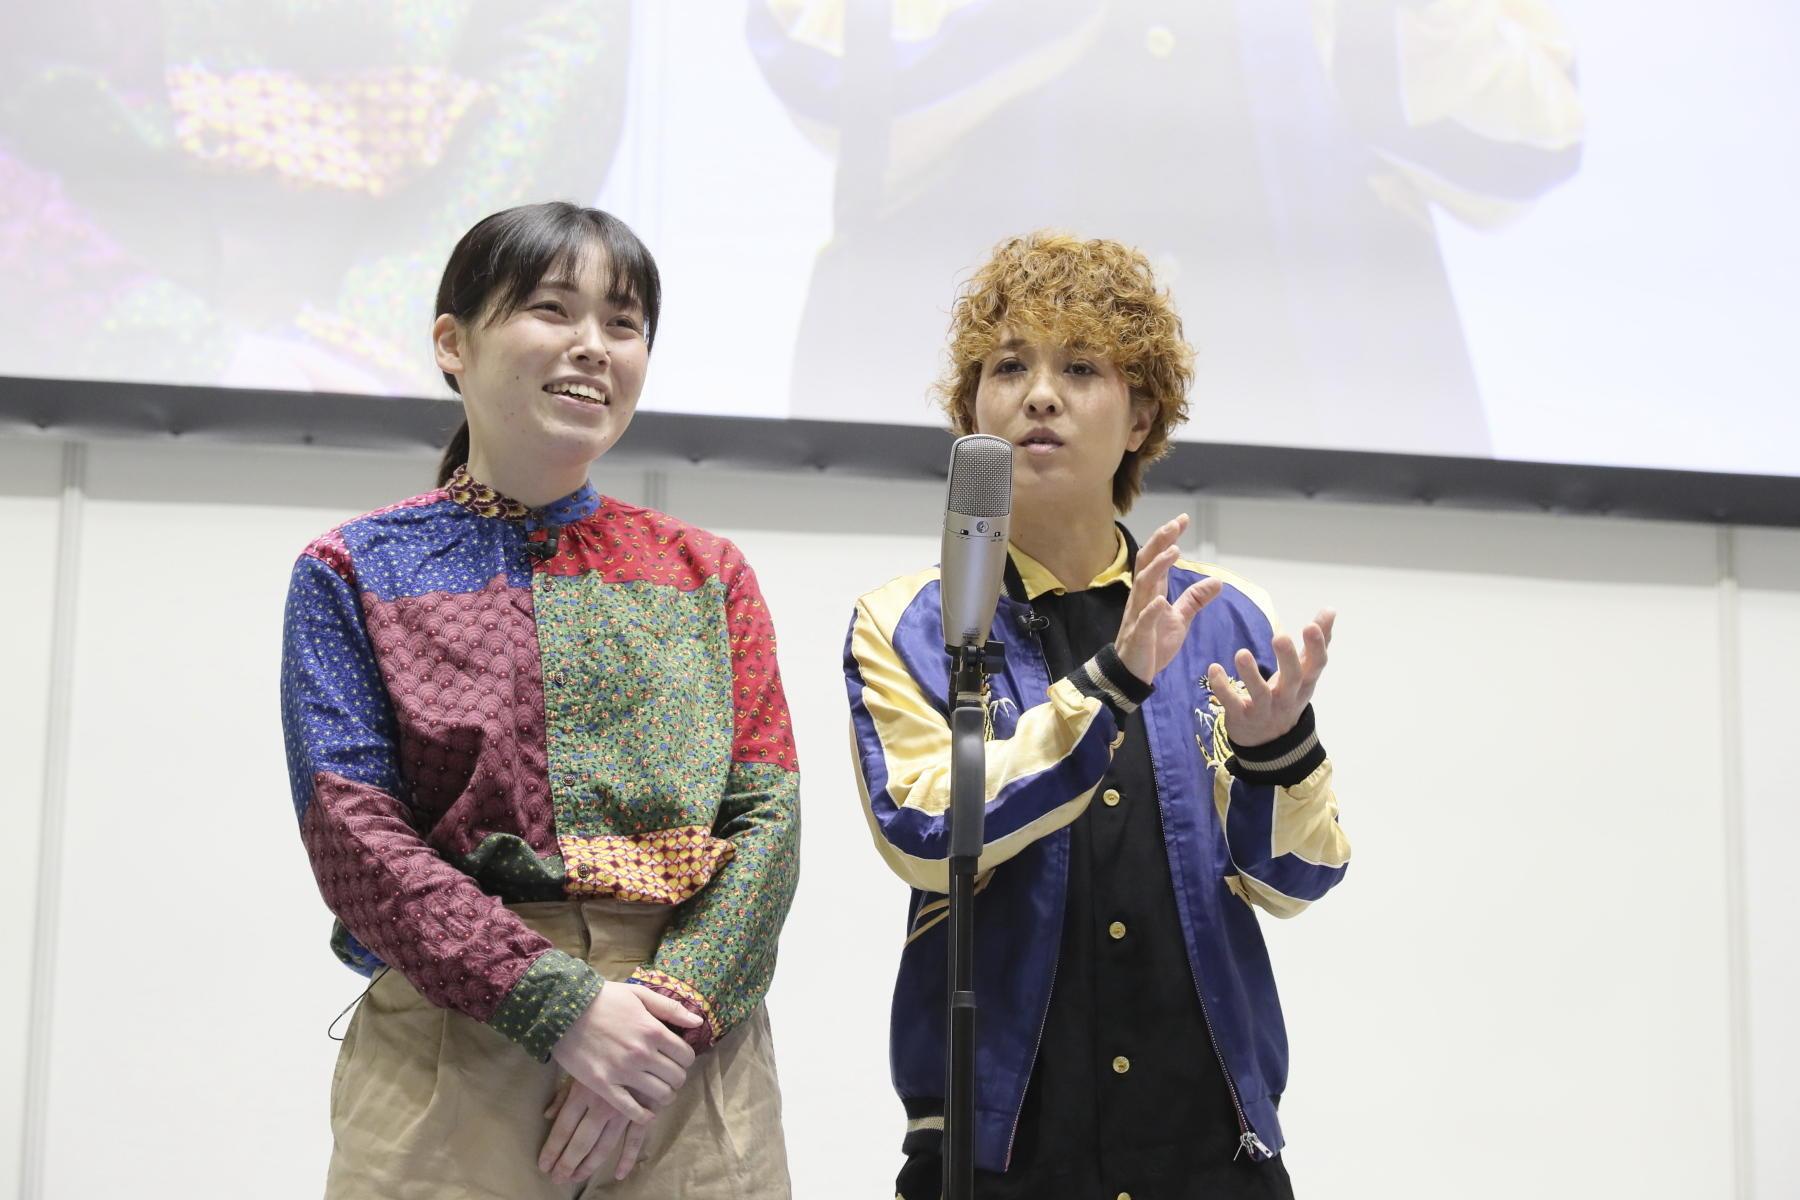 http://news.yoshimoto.co.jp/20181208232106-7e6d98888e9e22ef89ef1a02959ae3229d23f4de.jpg